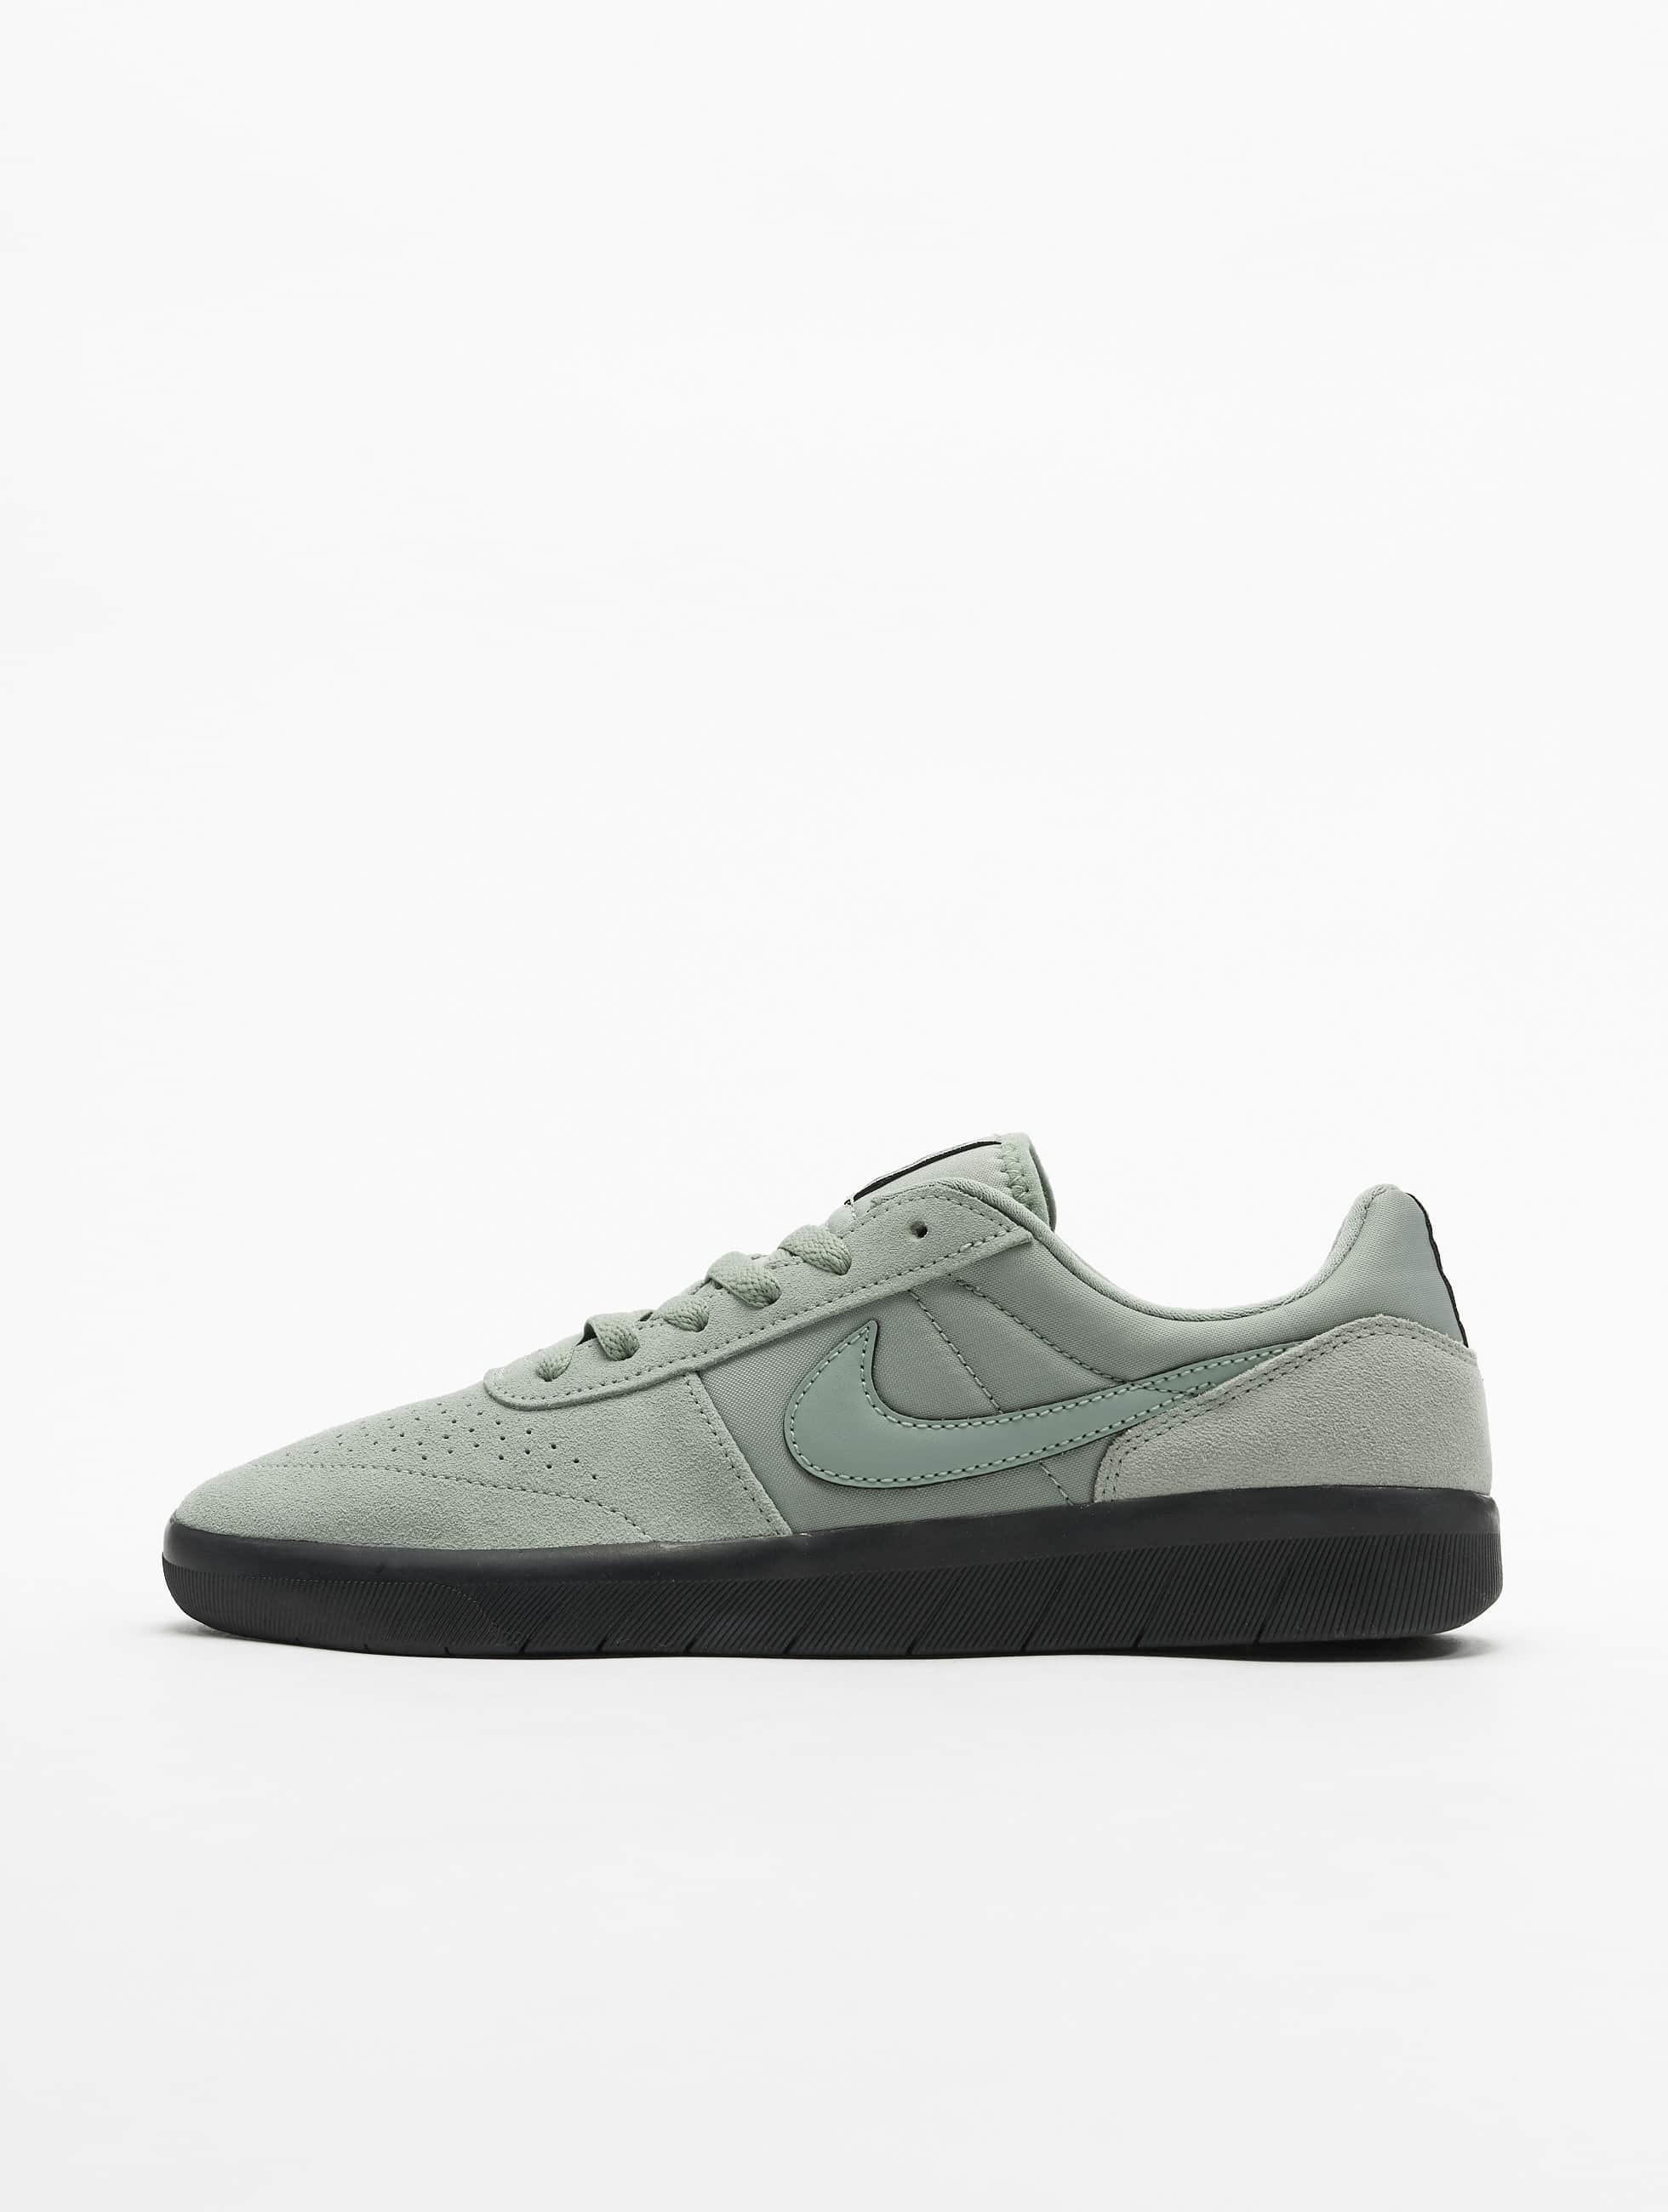 Nike SB Team Classic Sneakers Jade HorizonJade HorizonBlack